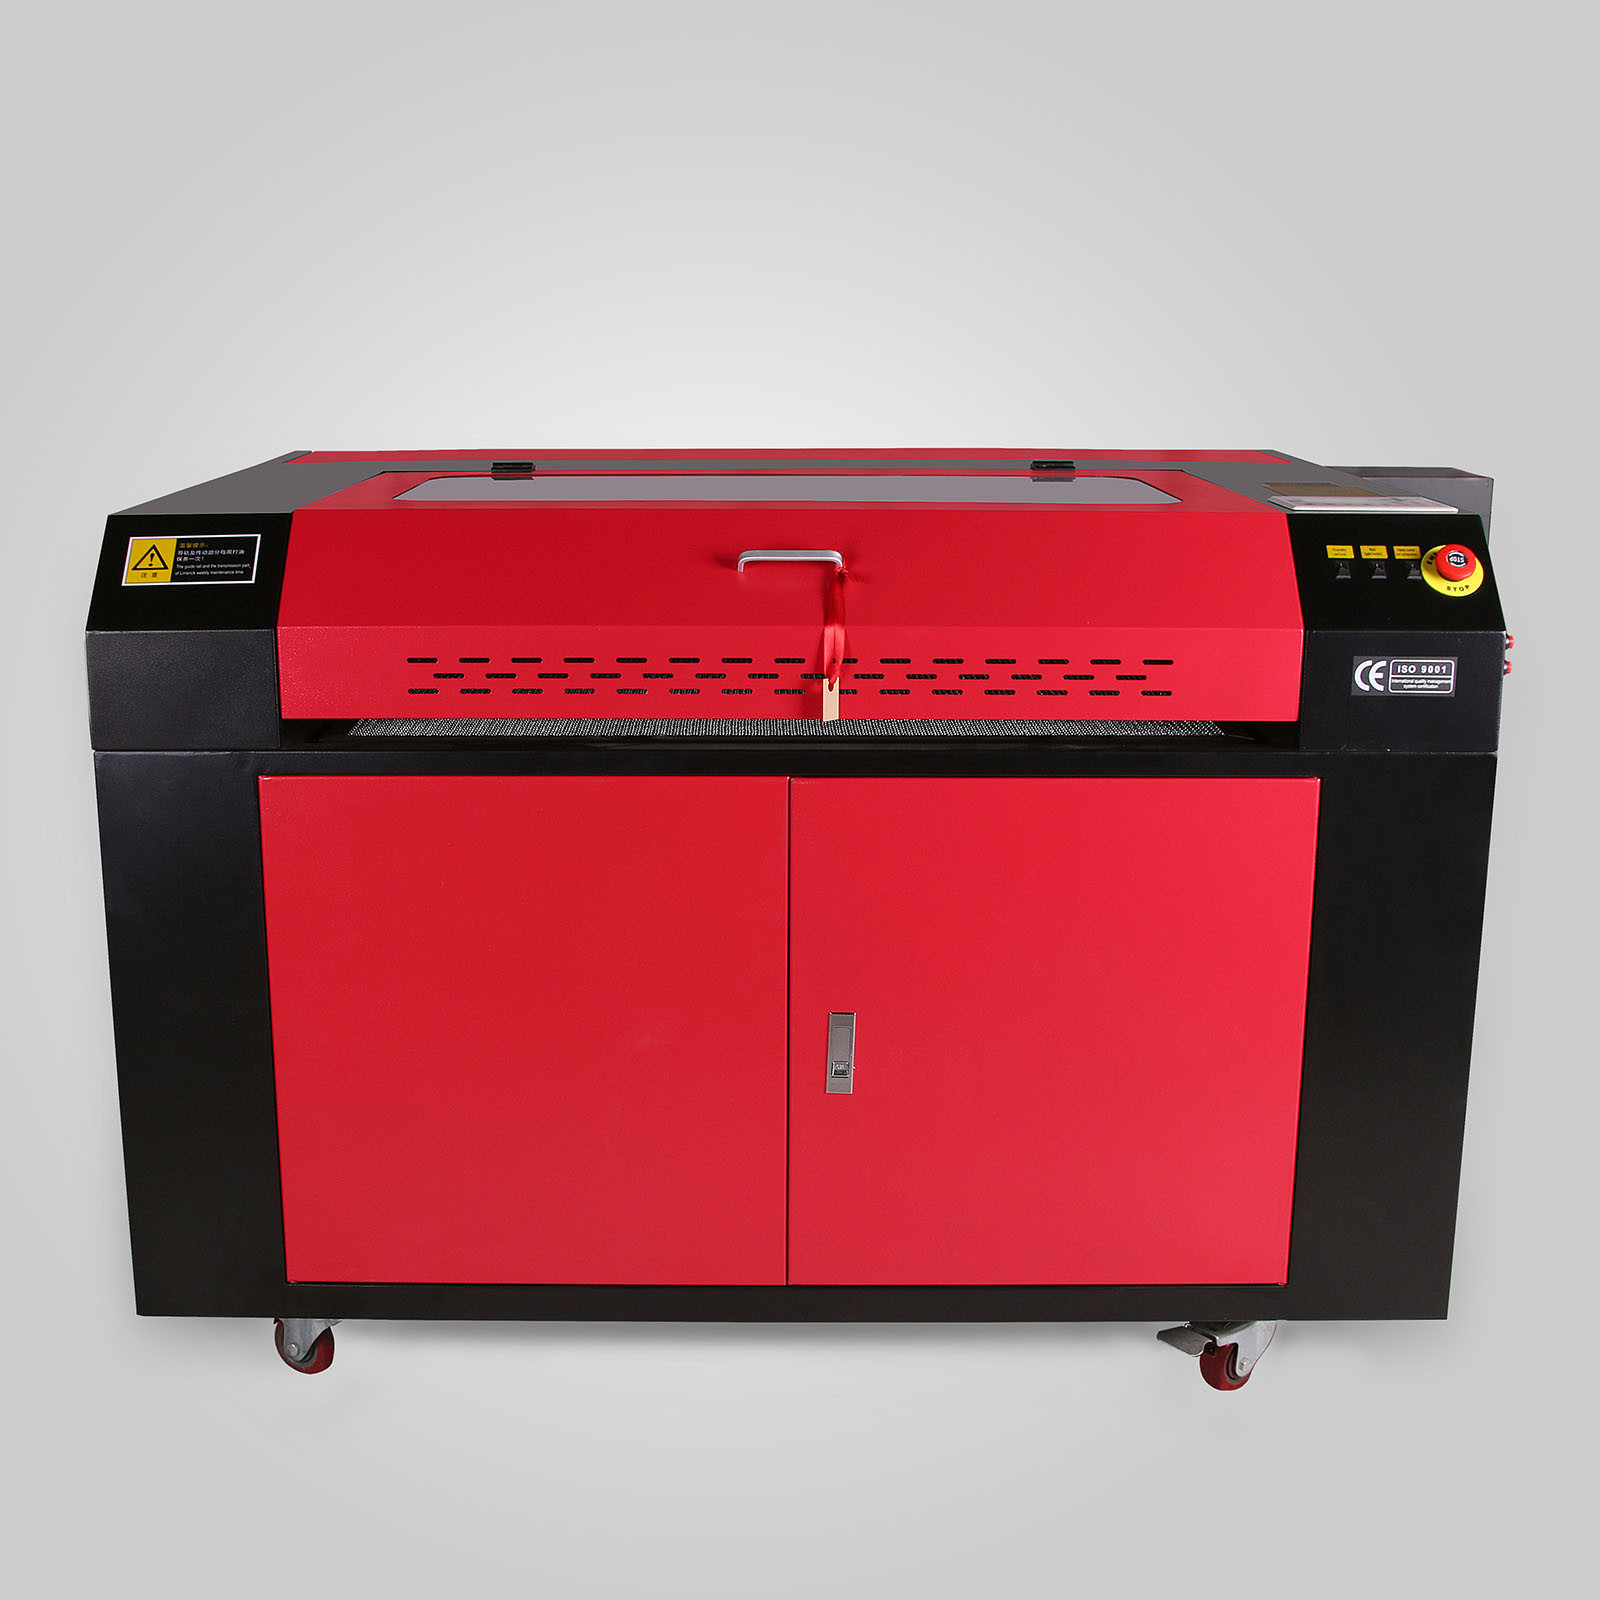 Macchina-per-Incisione-Laser-CO2-40-130W-Asse-Rotante-Tagliatrice-Incisore miniatura 61